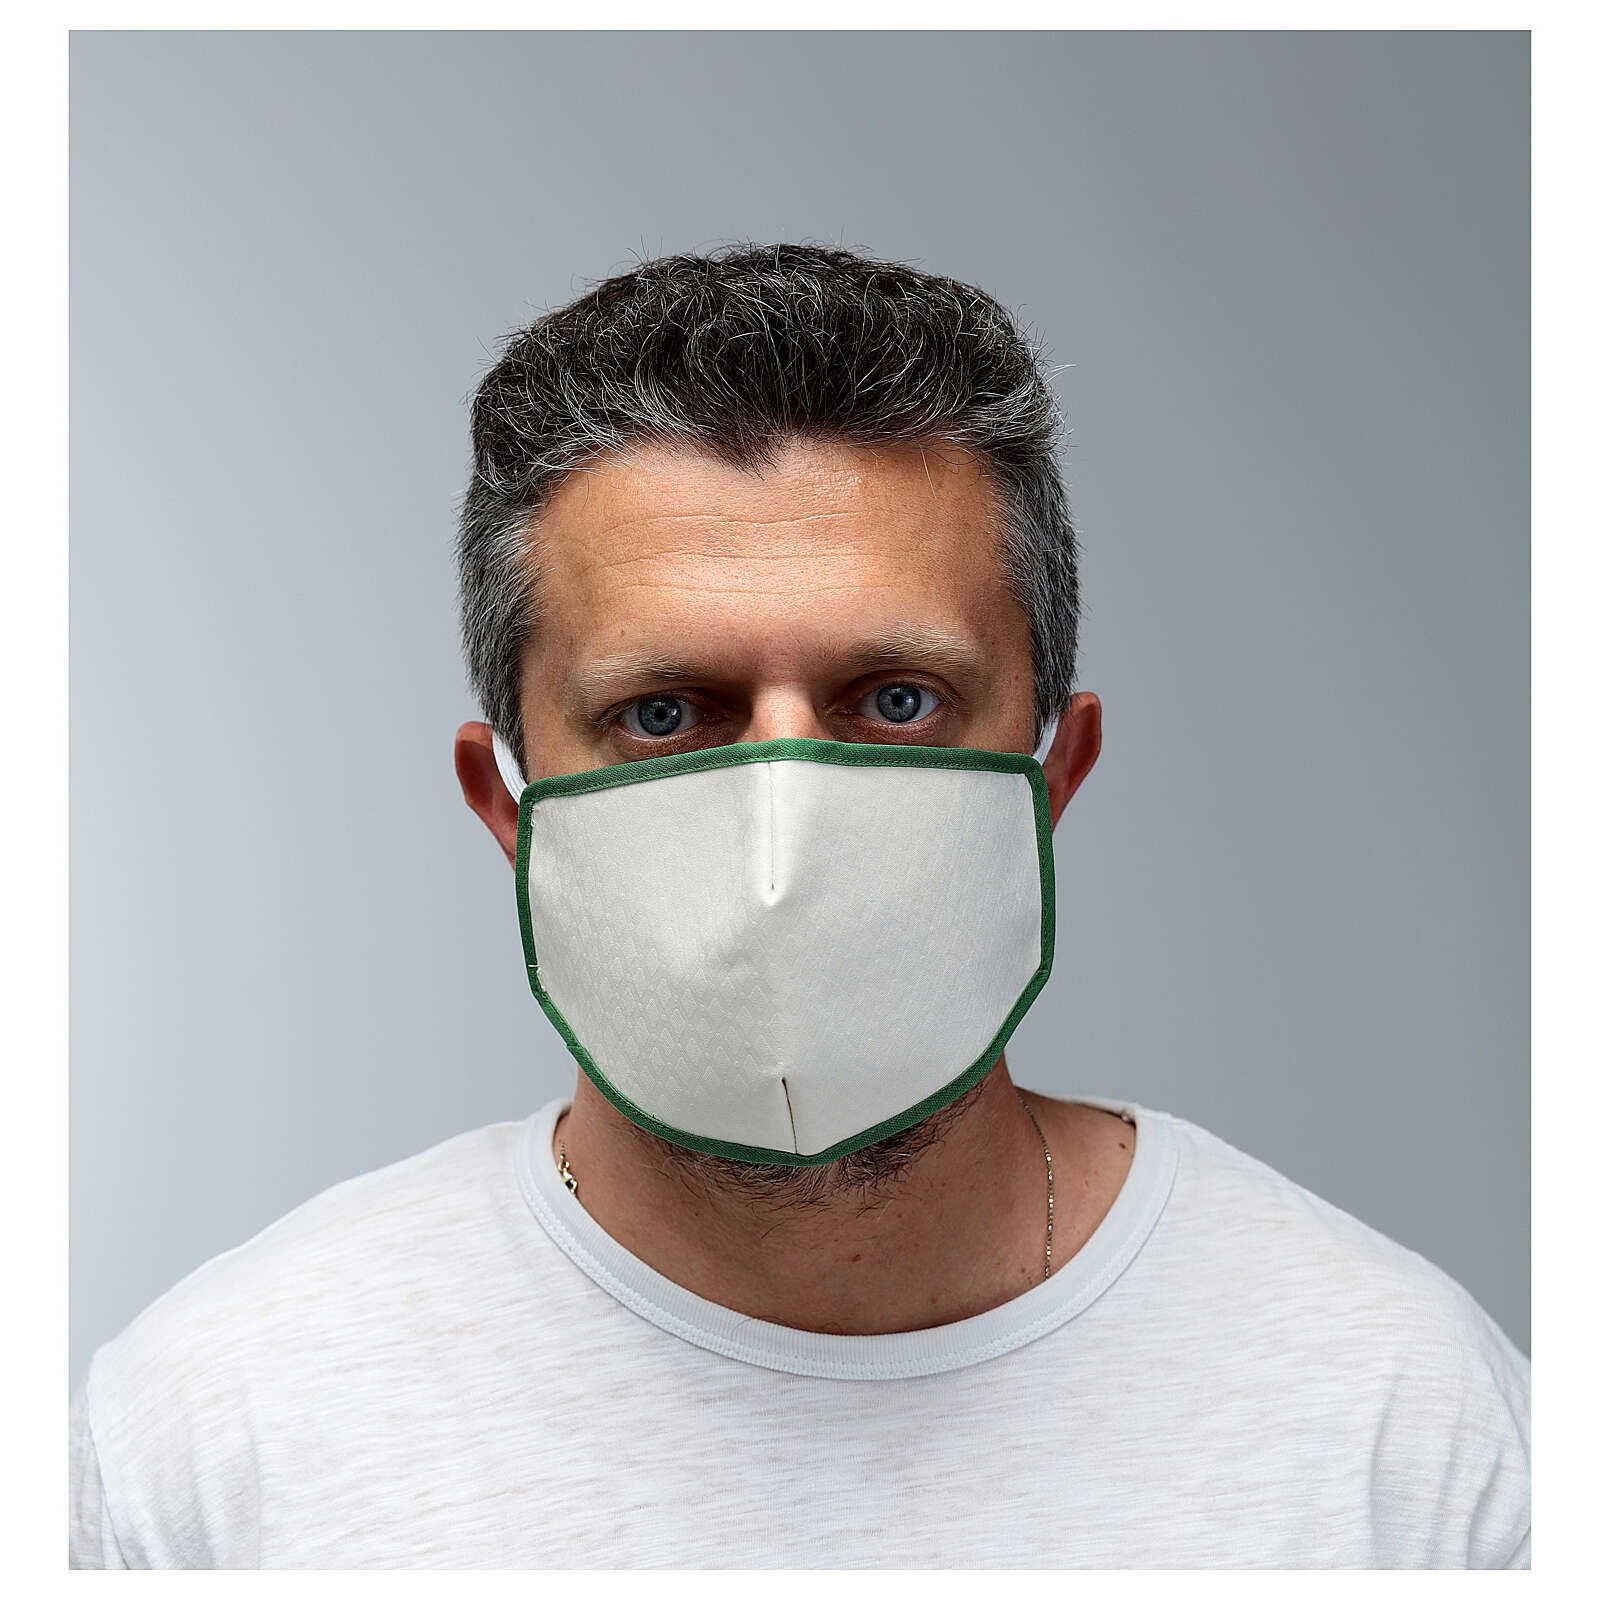 Fabric reusable mask with green edge 3